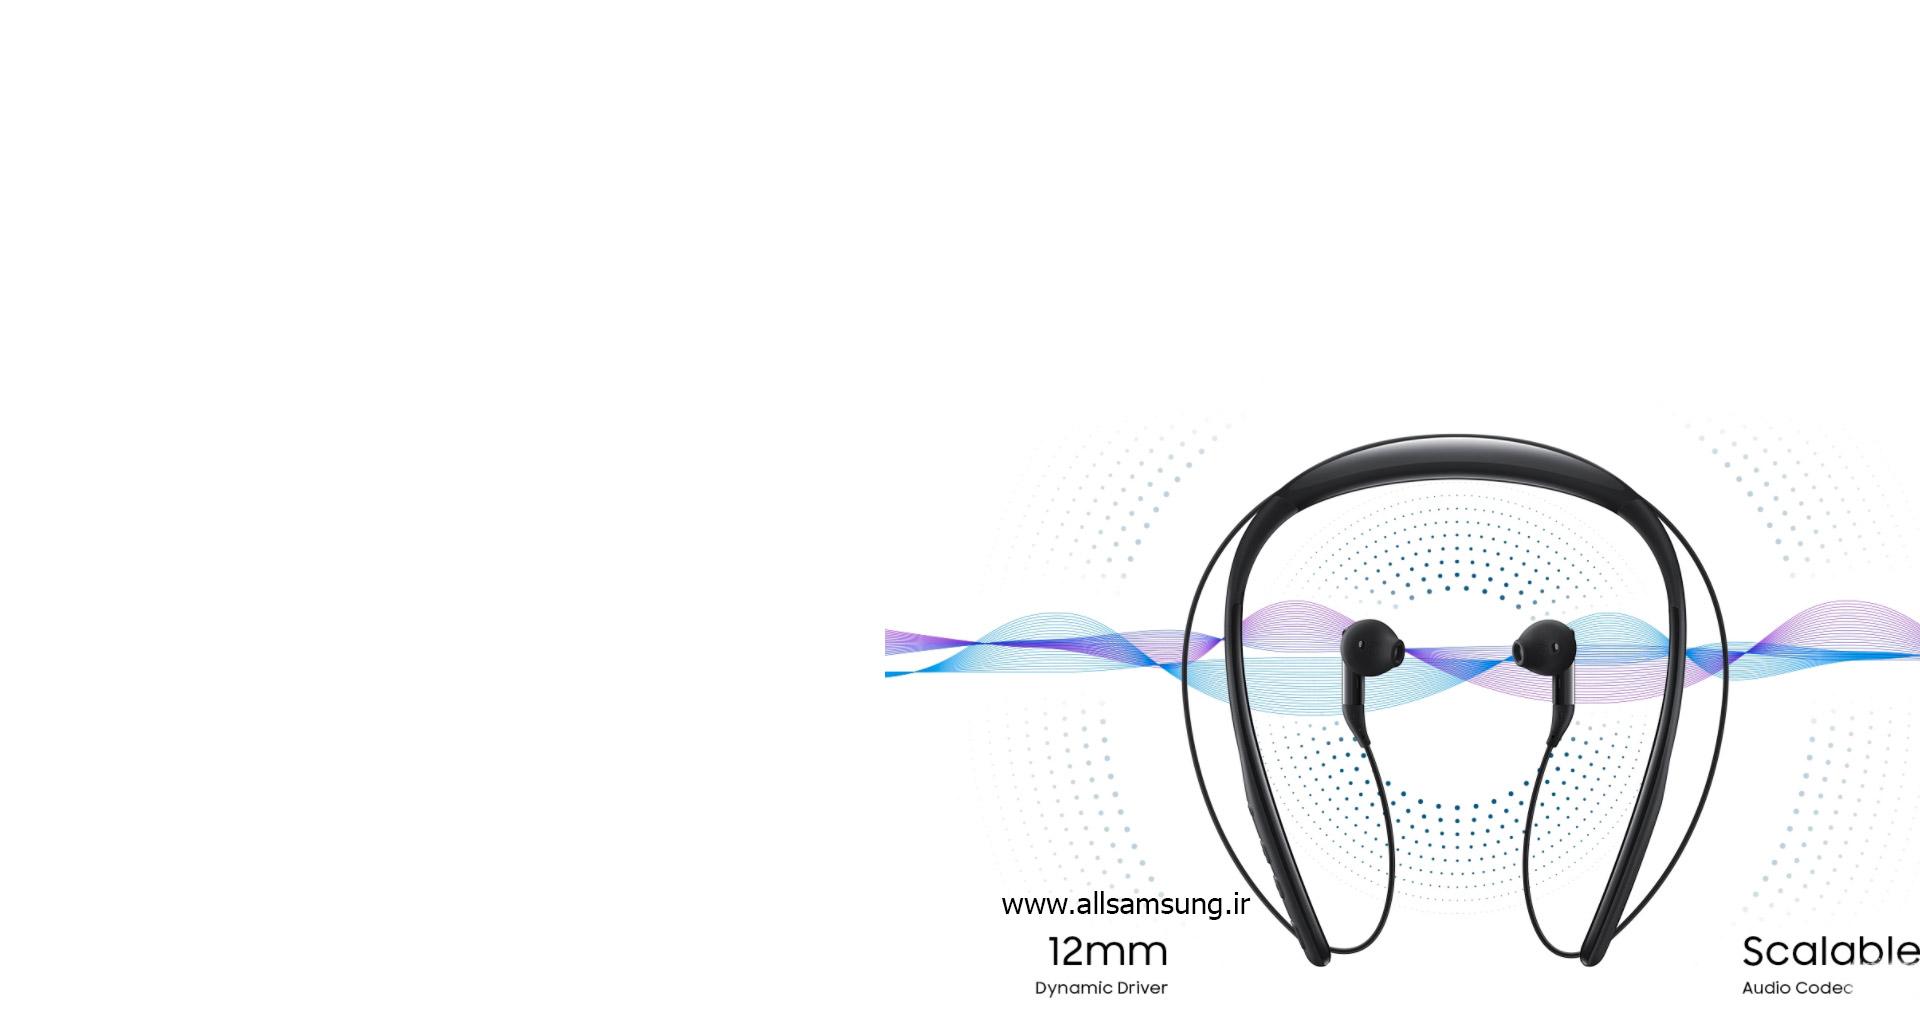 گوشی s21 ultra 5g